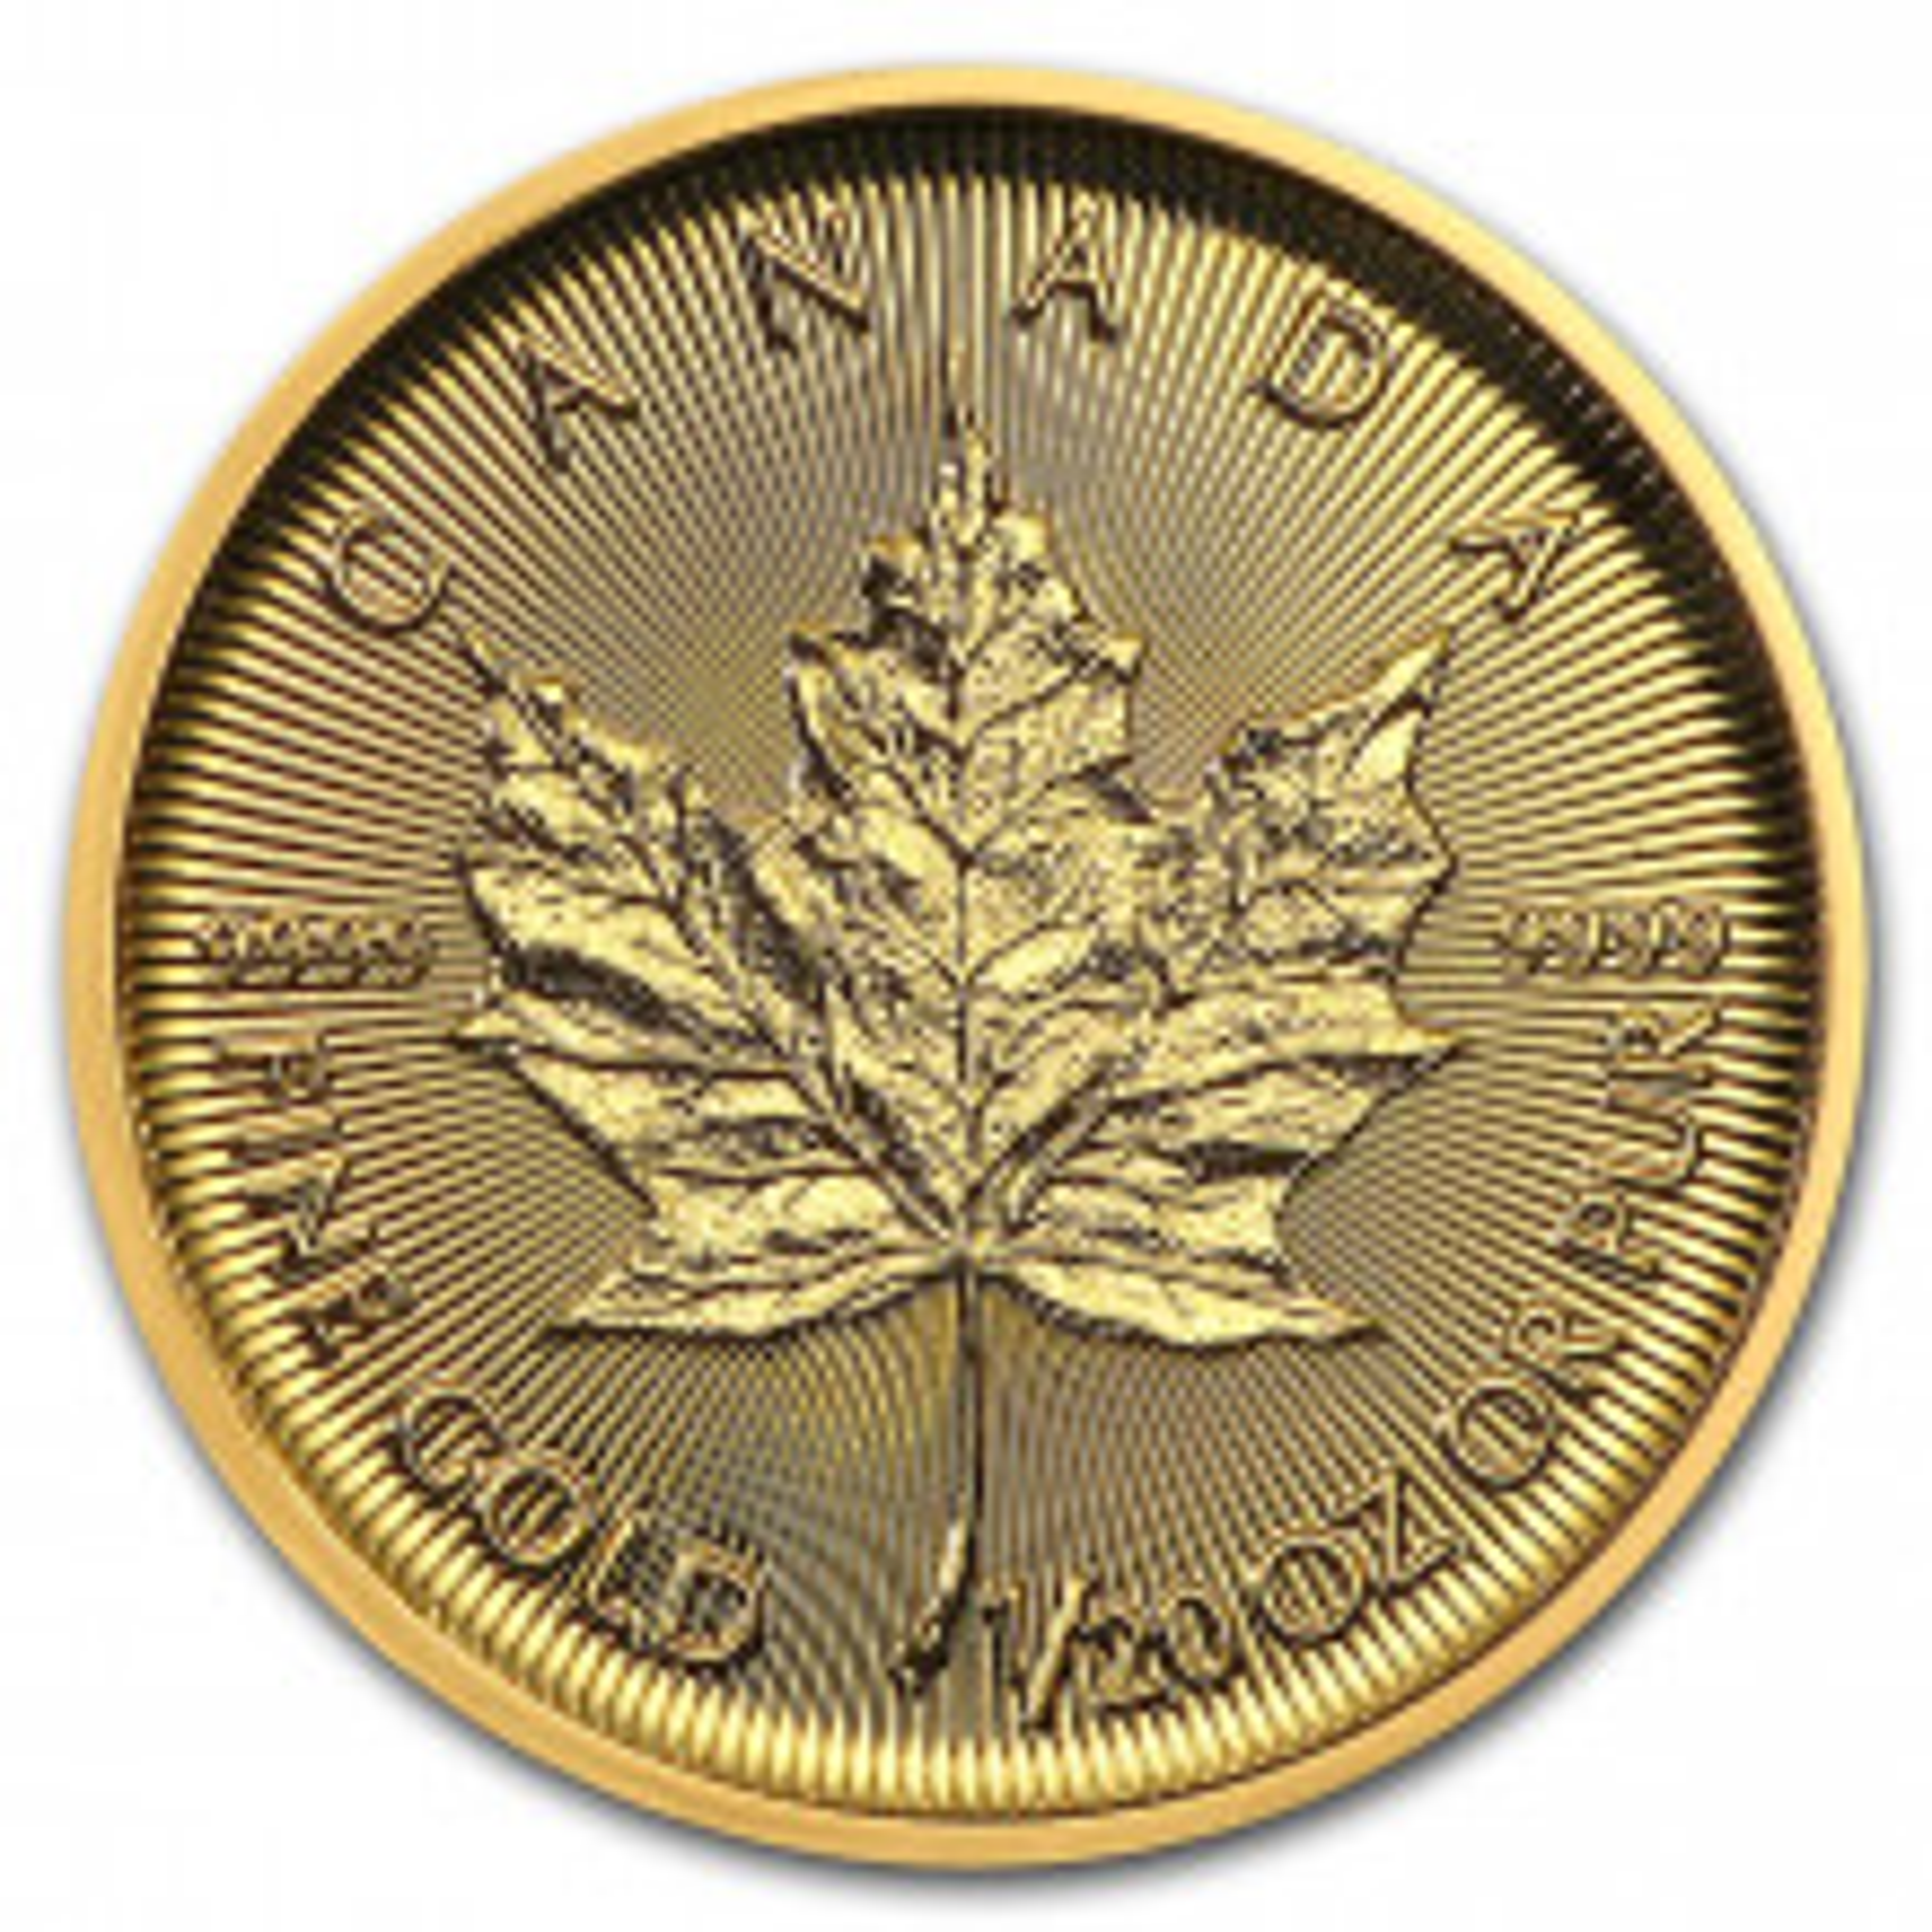 Gold 1/20 troy ounce Maple Leaf coin 2021